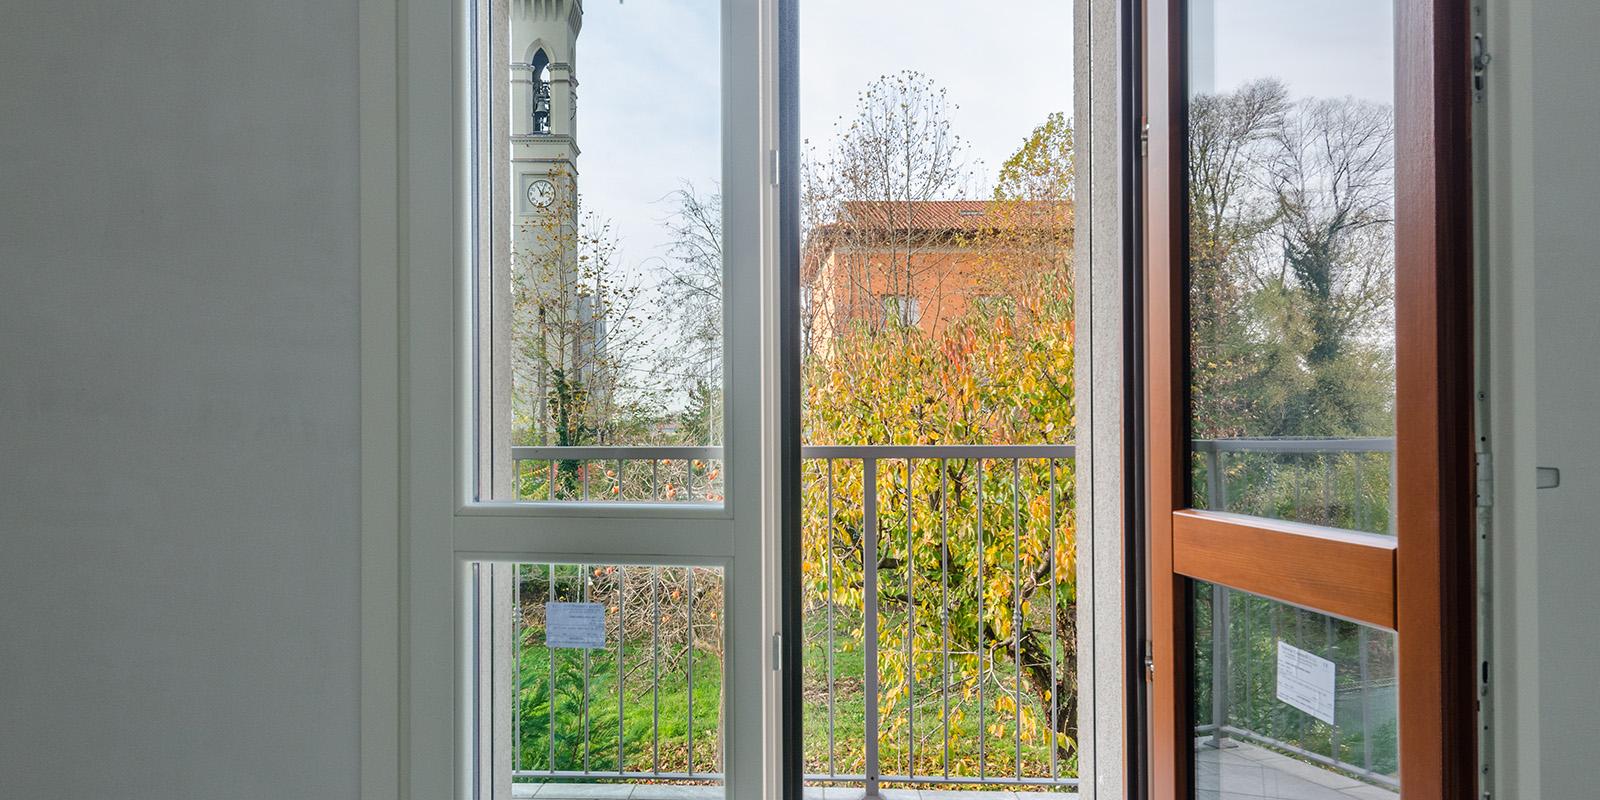 Epis_Bagnatica_Residenza_del_Sole_6